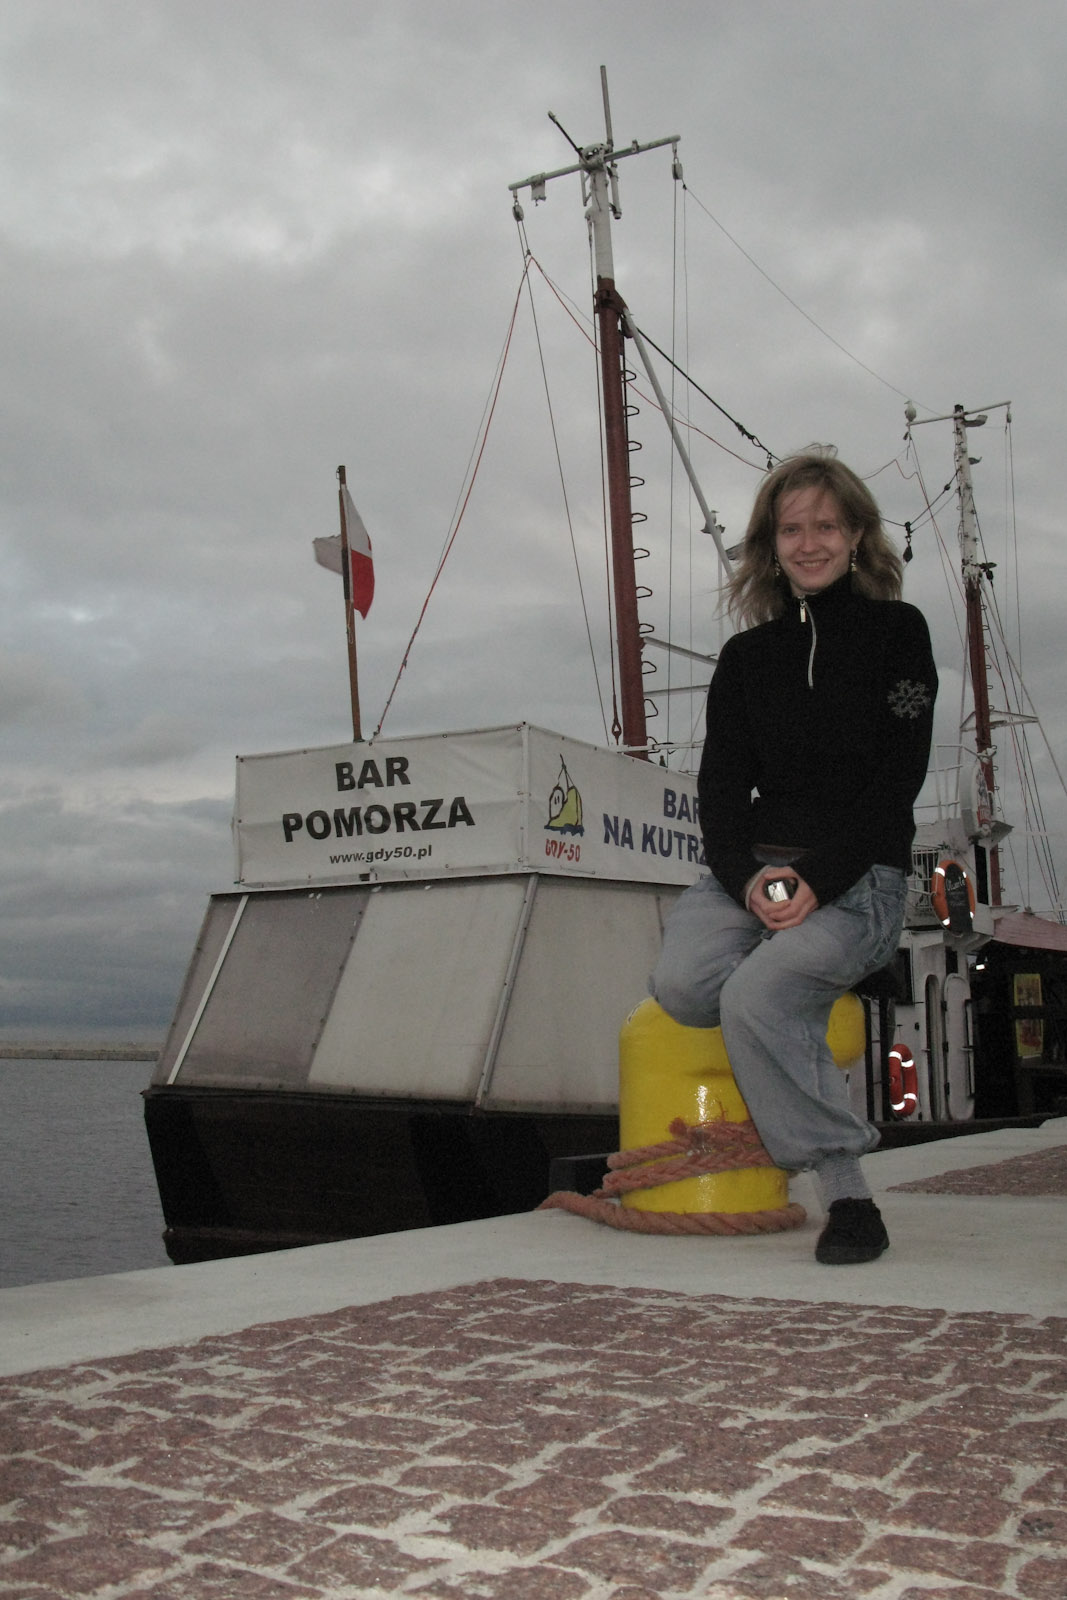 Hanne naast Bar Pomorza (parodie schip afgemeerd naast Dar Pomorza (Gift of The Coast / Pomerania) - vormalig schip van Marine Academy)